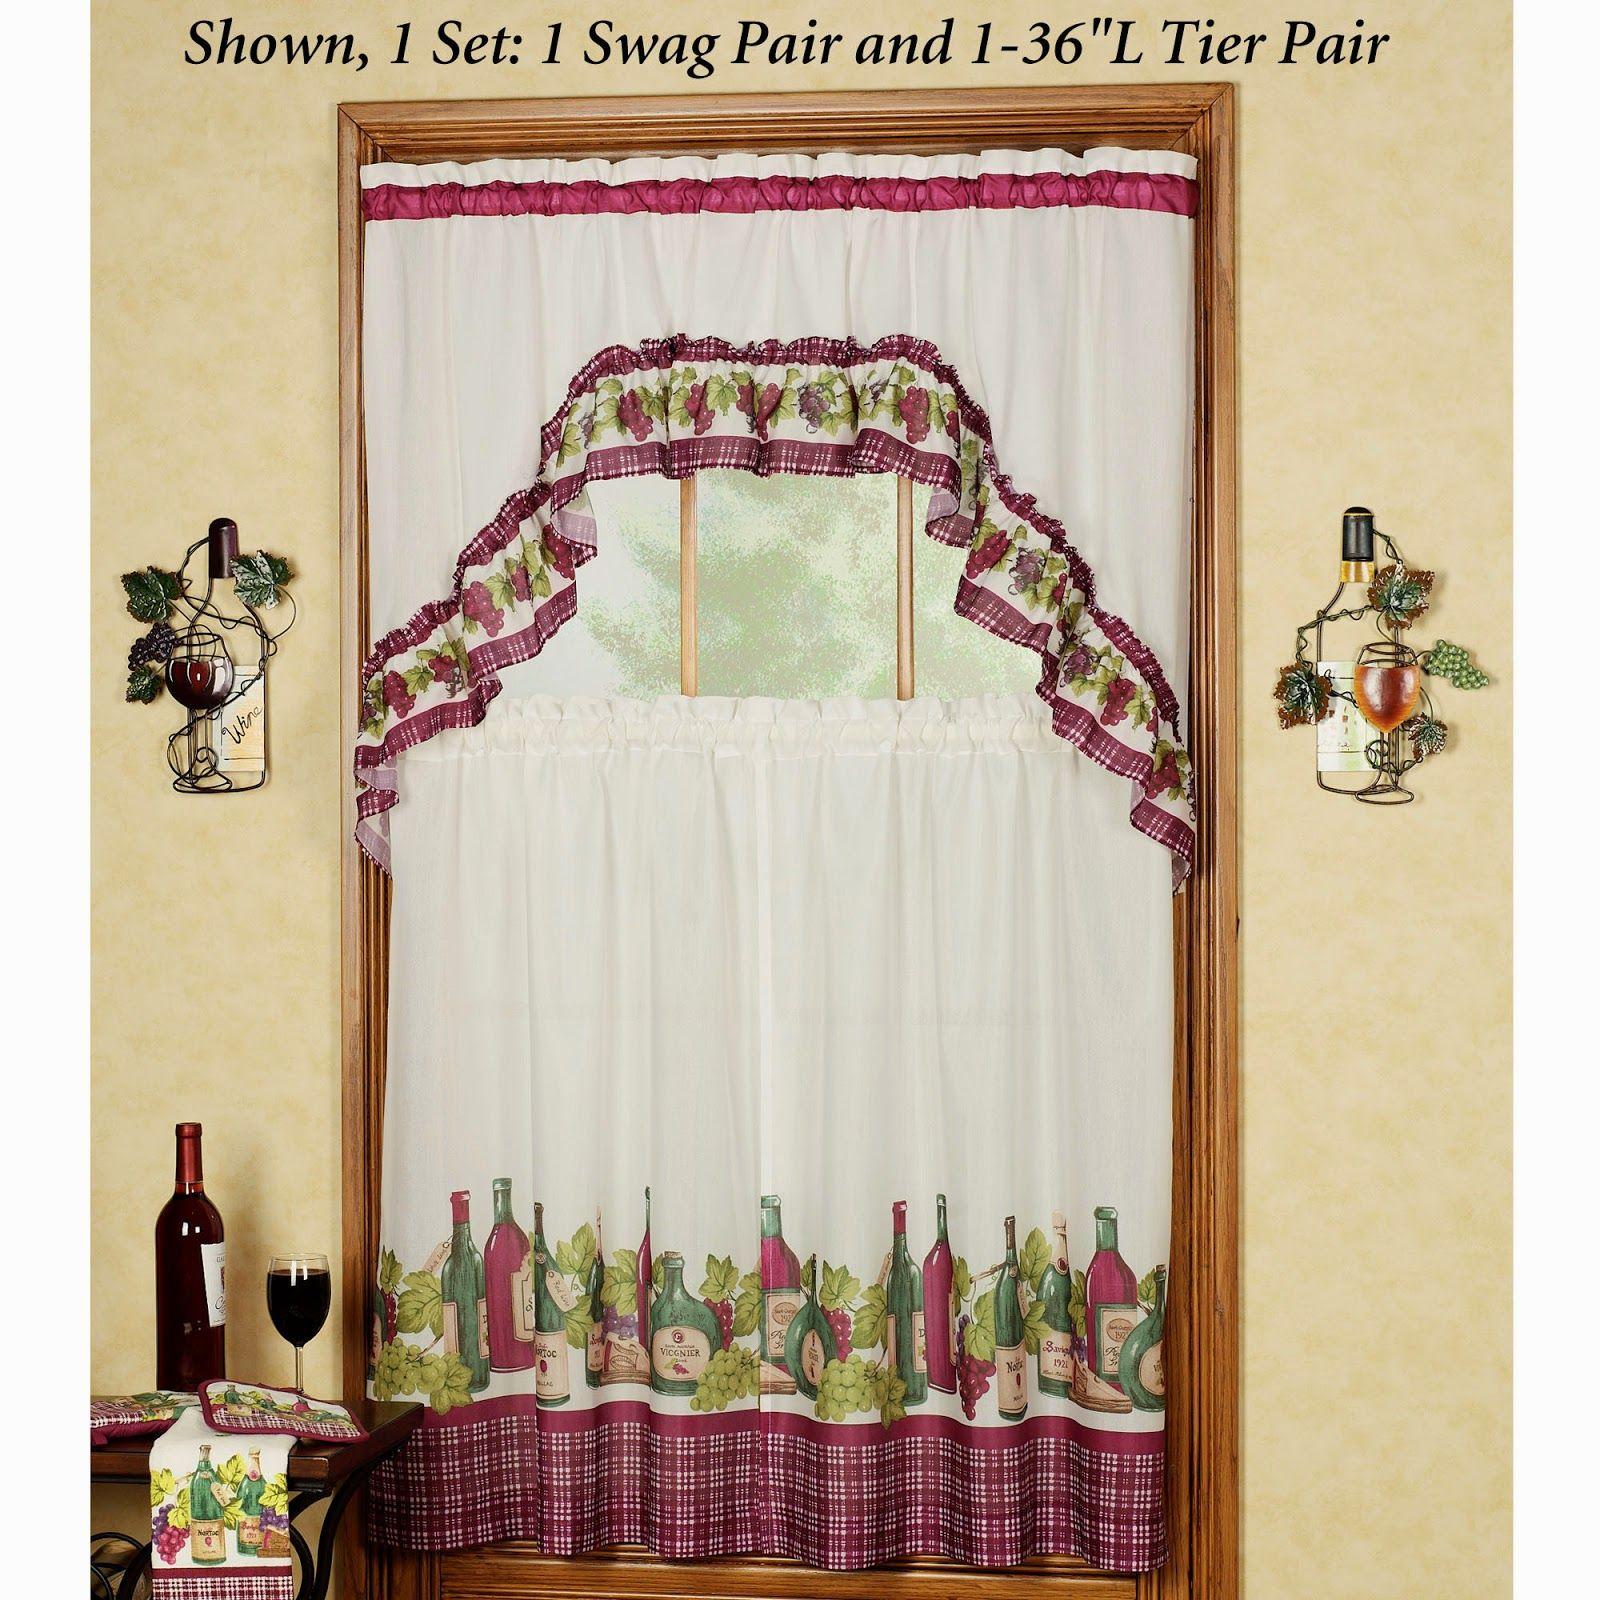 Curtain Ideas Kitchen Curtains Grapes Wine Bottles Grape Decor Kitchen Curtains Wine Themed Decor